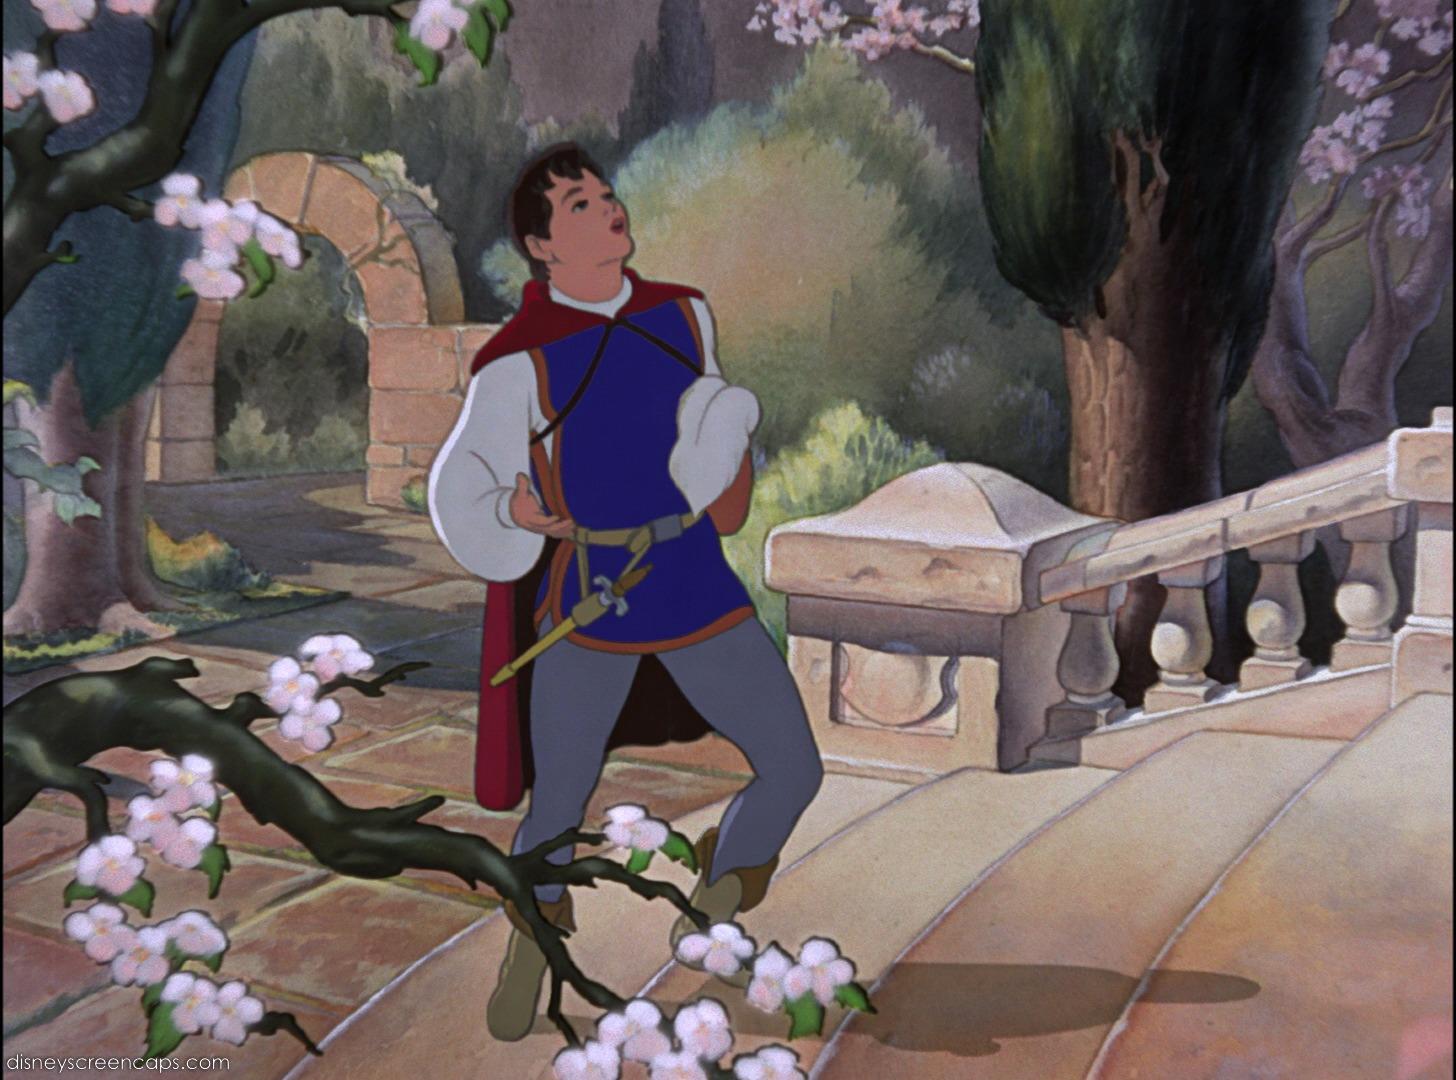 Prince Ferdinard